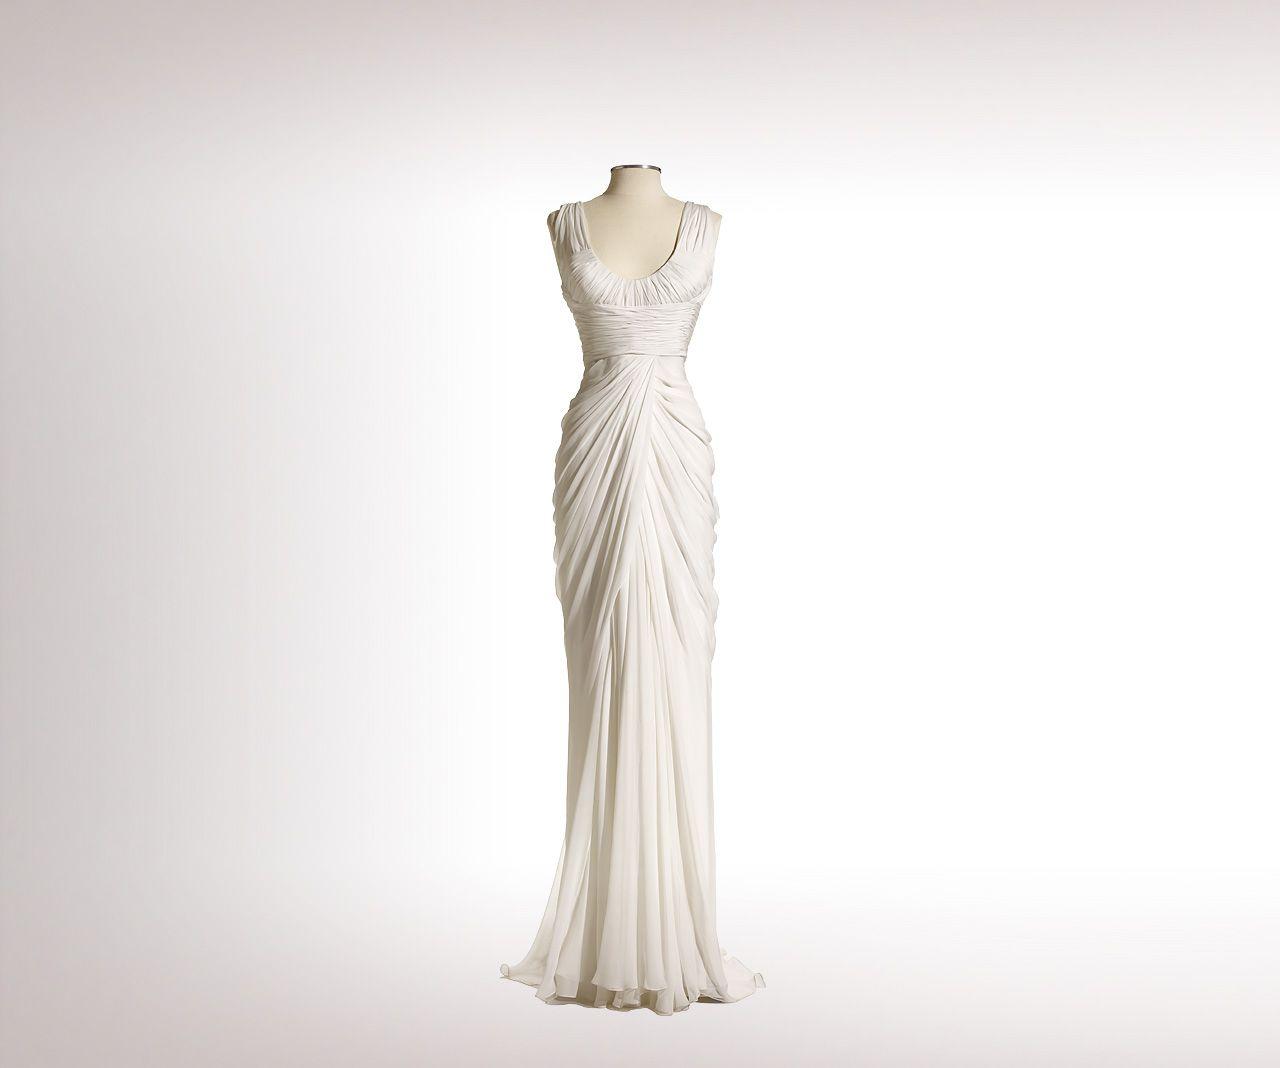 J Mendel Wedding Dress 2013 Bridal Josephine J Mendel Bridal Bridal Dresses Wedding Dress Couture